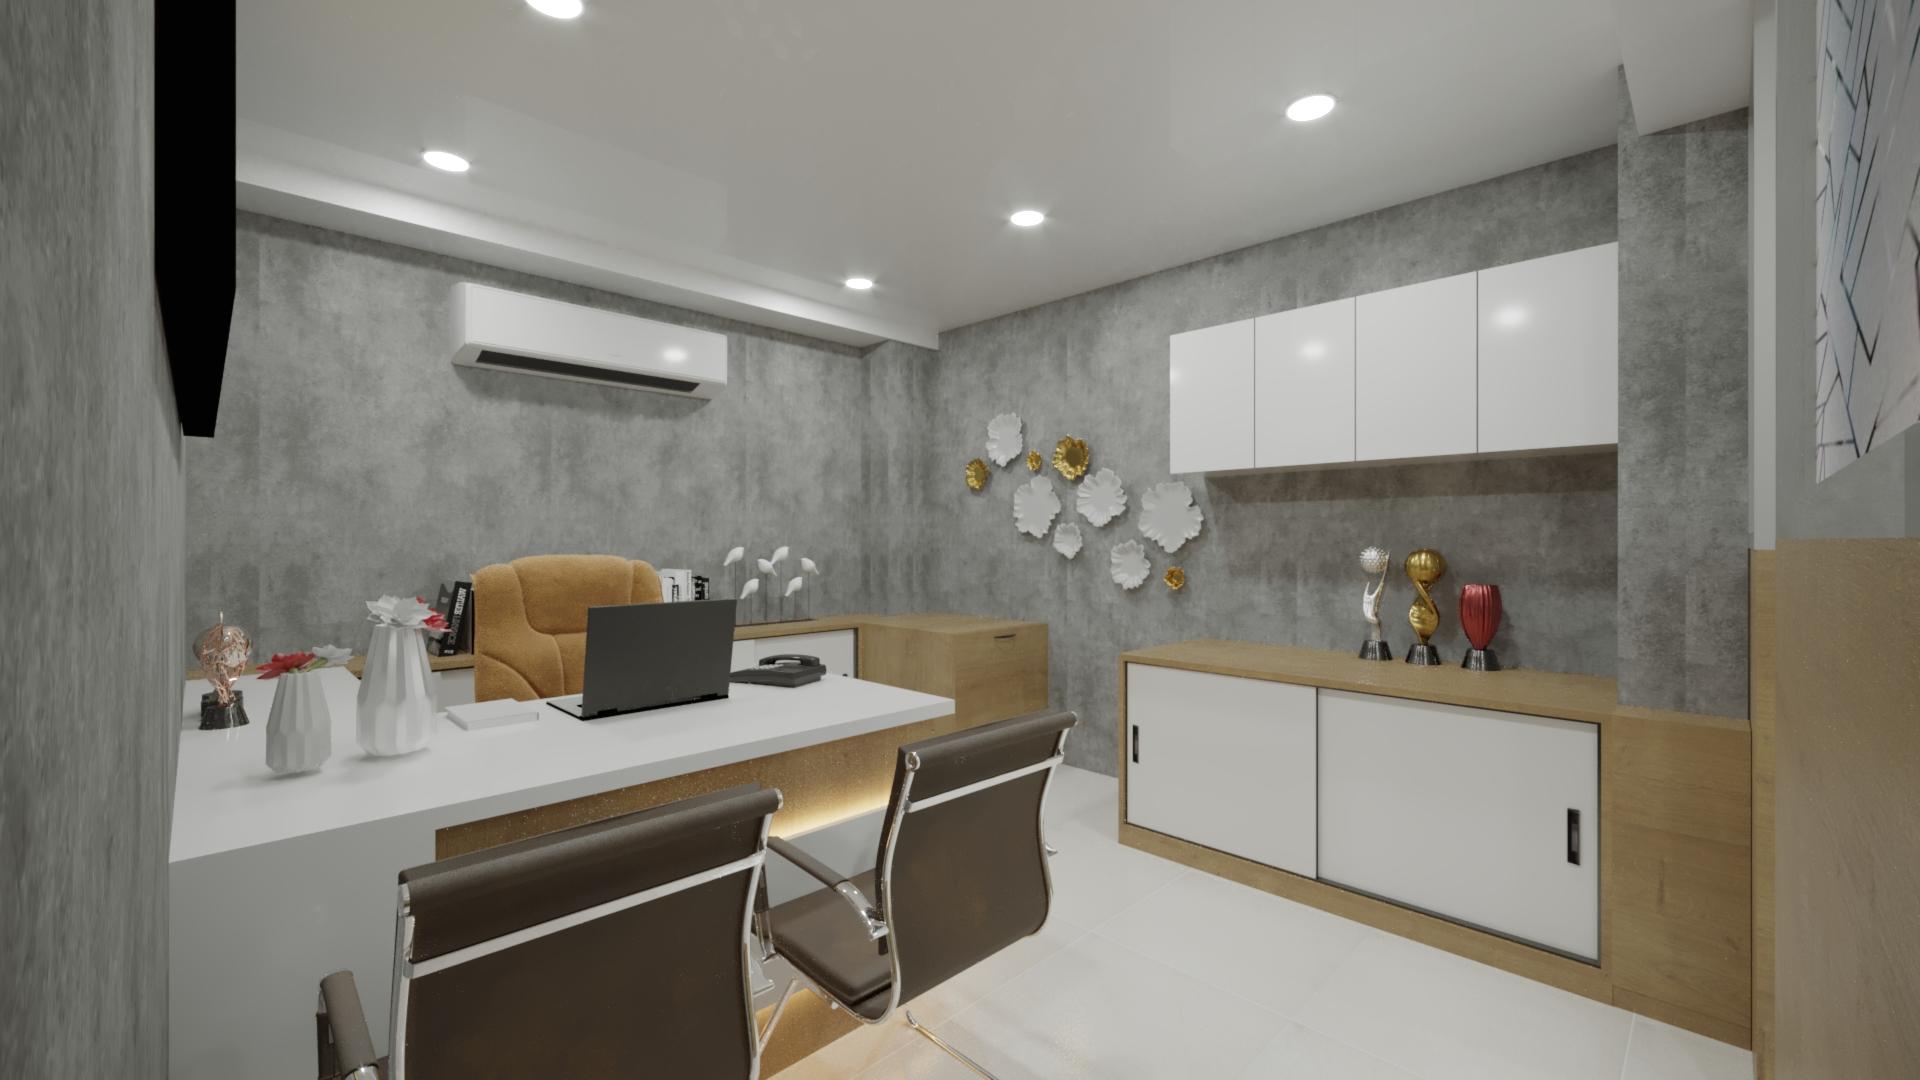 Viswasri Silver Jewelry commercial interiors TriShades